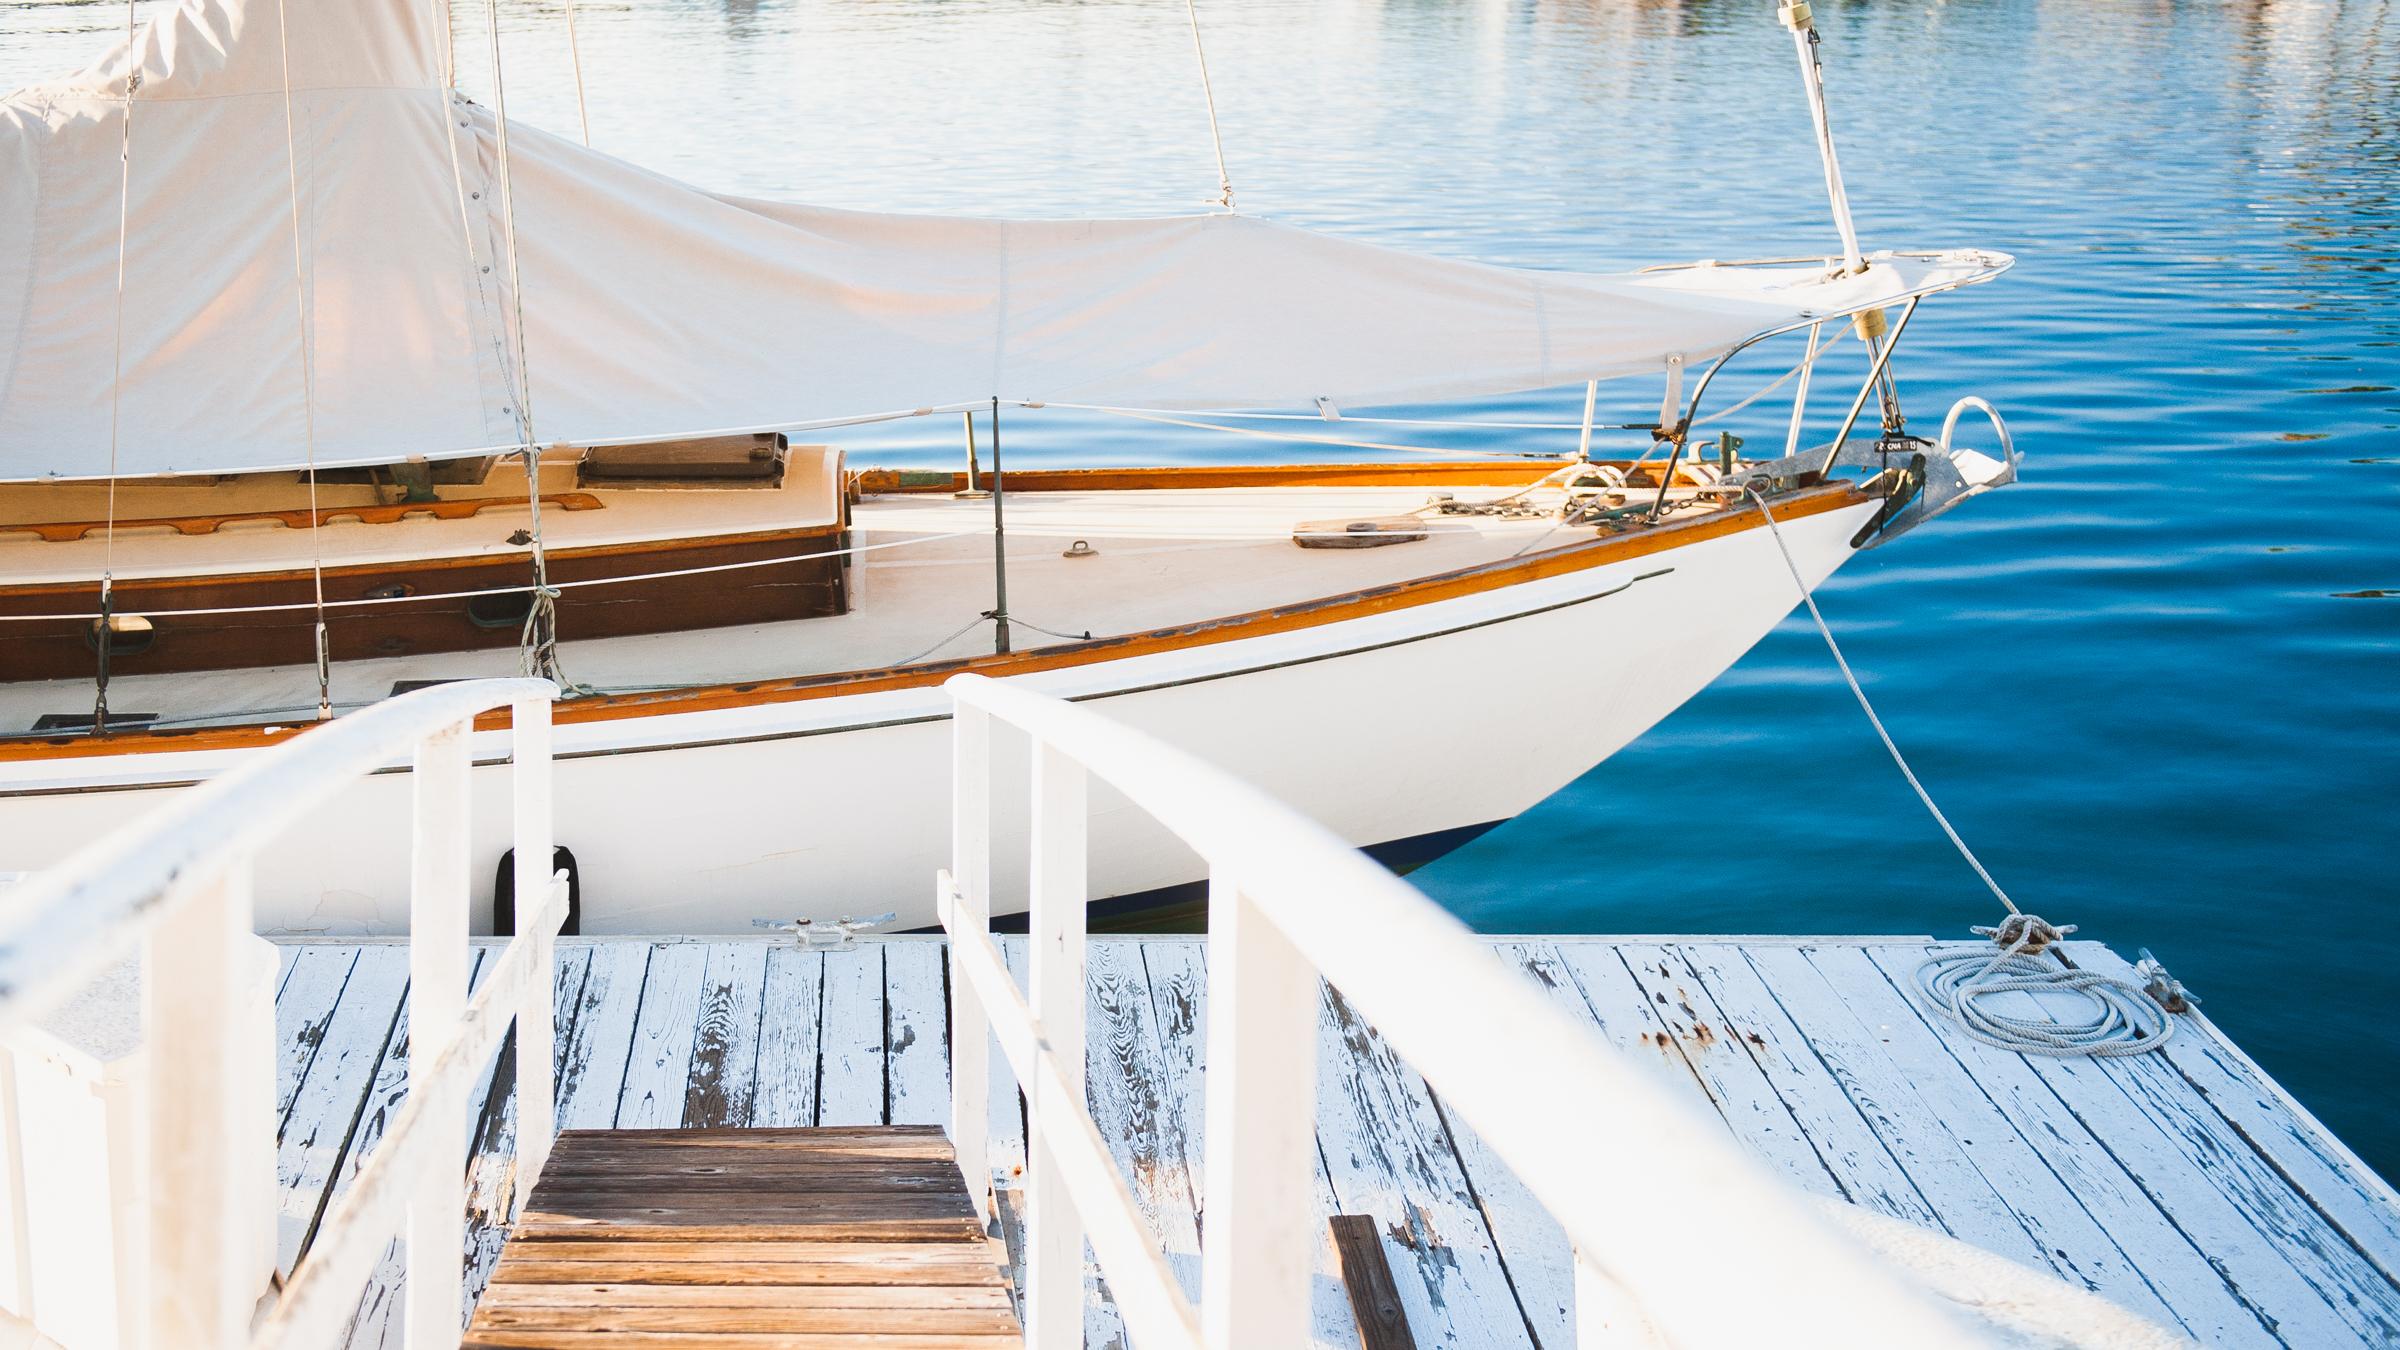 Copy of Copy of Long Beach Sailboat